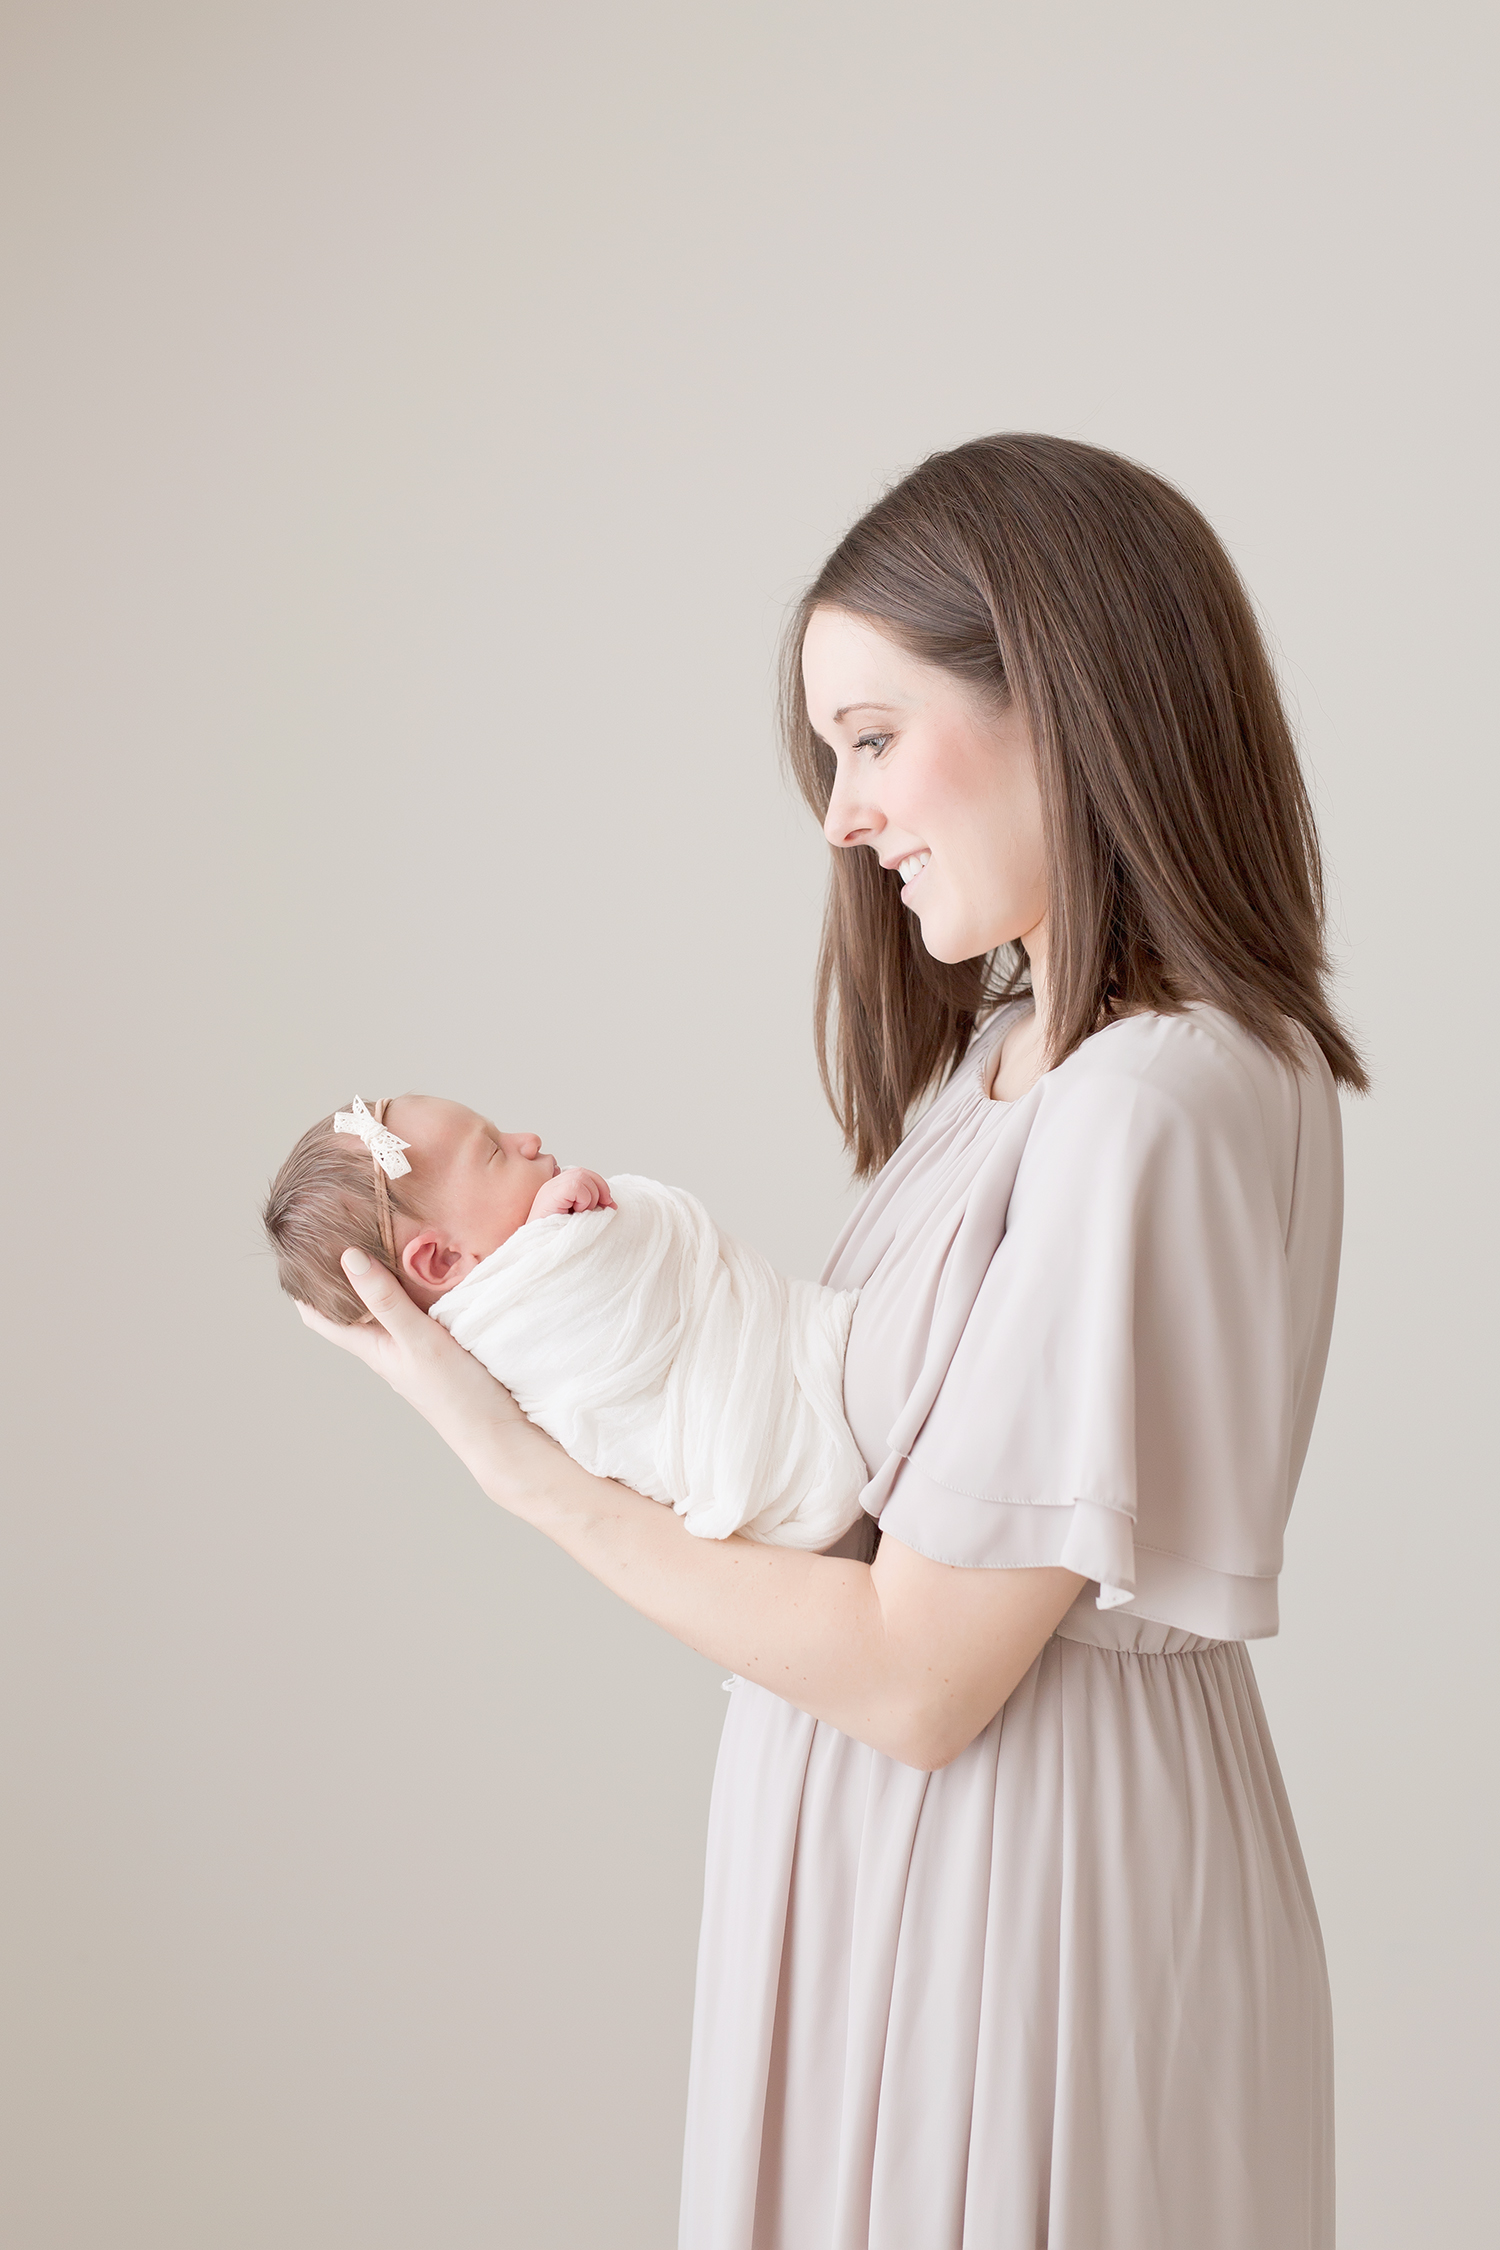 Northern-VA-Newborn-Photographer-162.jpg